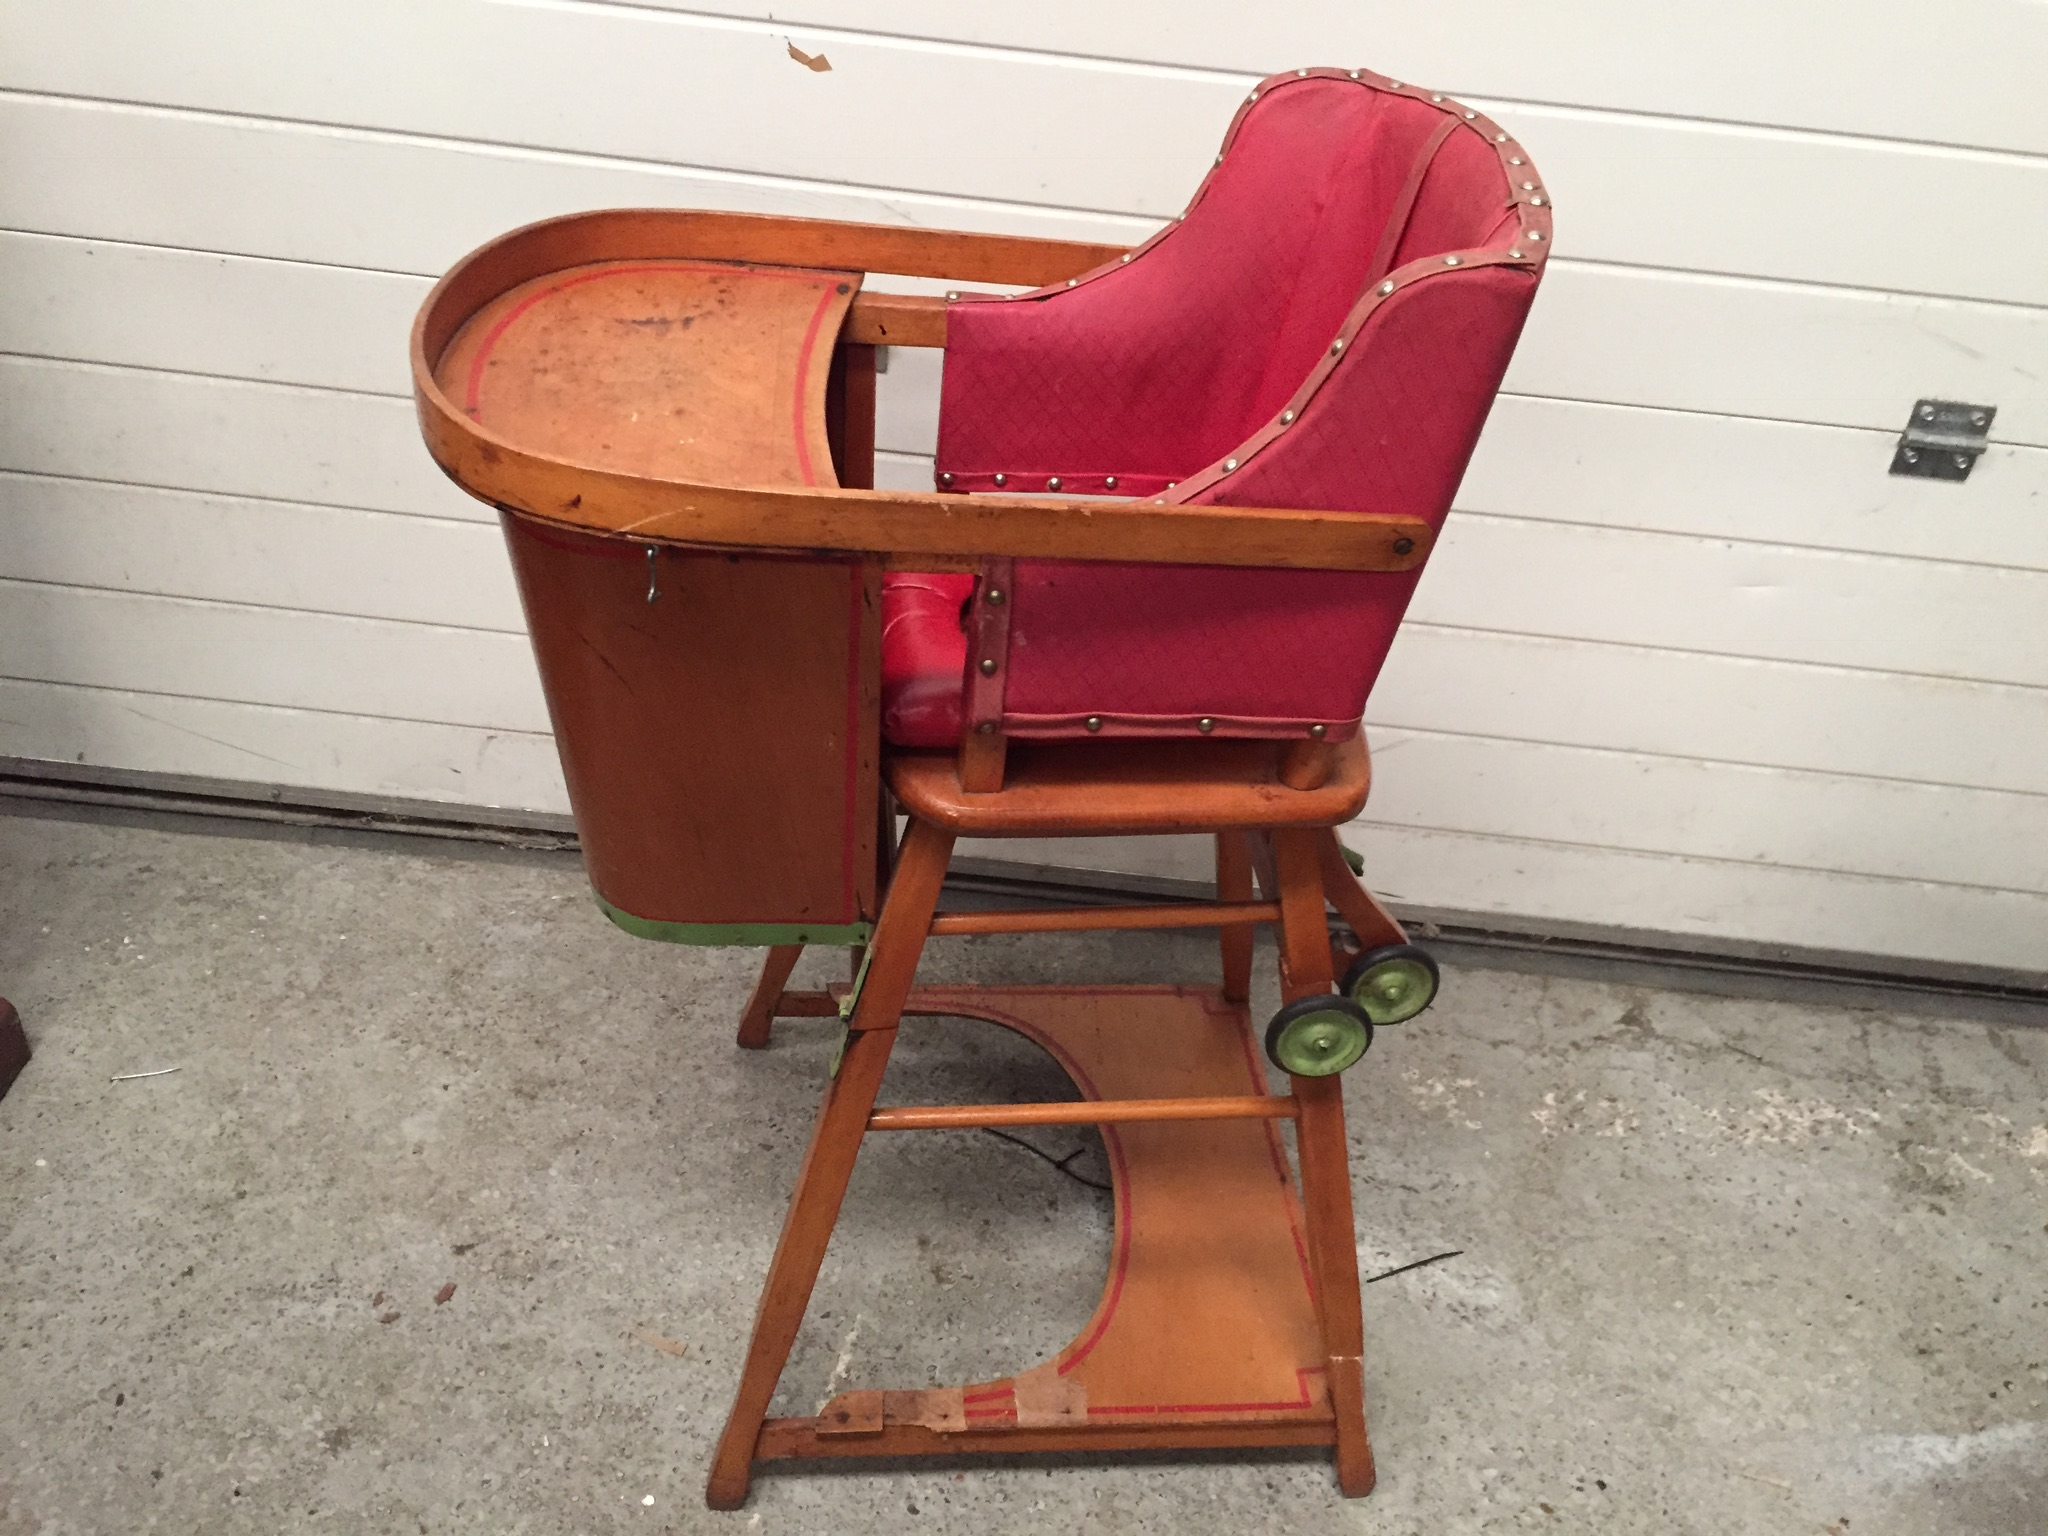 Ouderwetse Houten Kinderstoel.Antieke Kinderstoel Houten Kinderstoel Landzicht Houtsberg